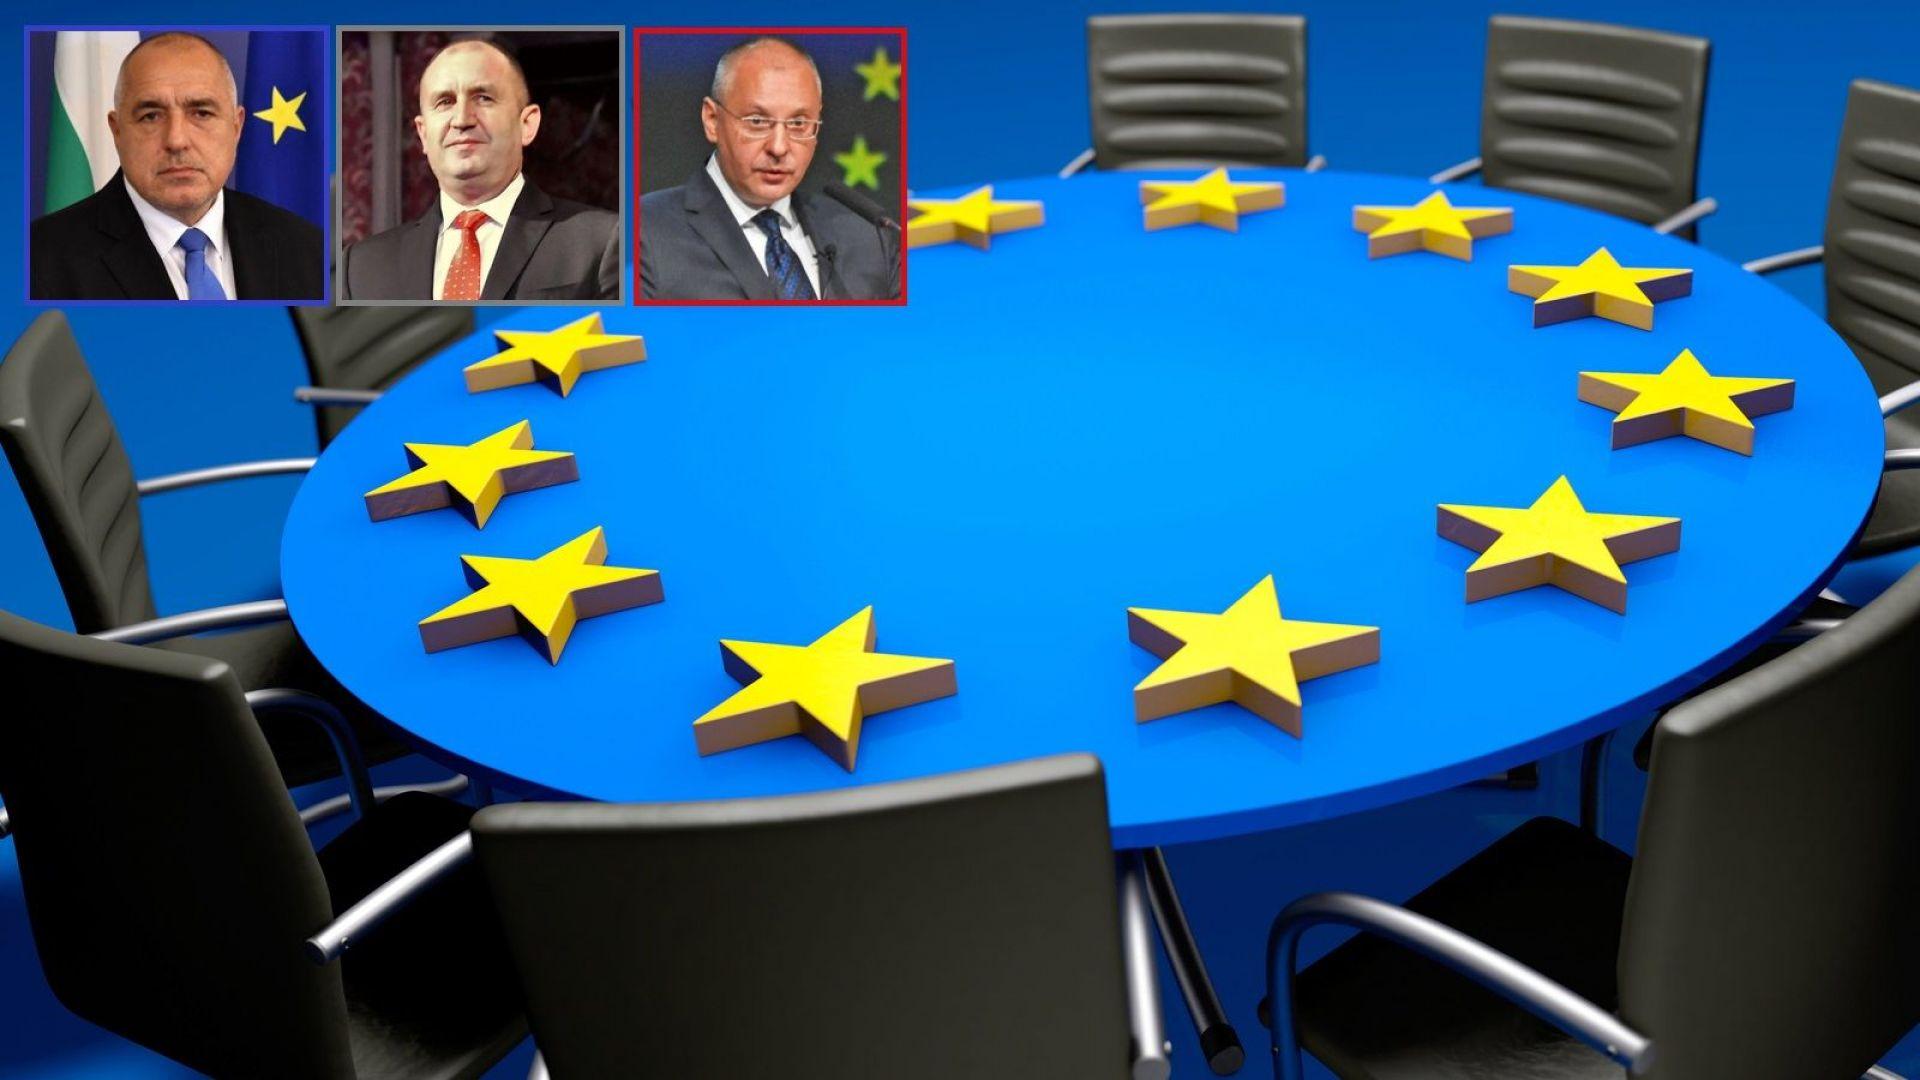 Борисов, Радев и Станишев с най-голям авторитет в Европа